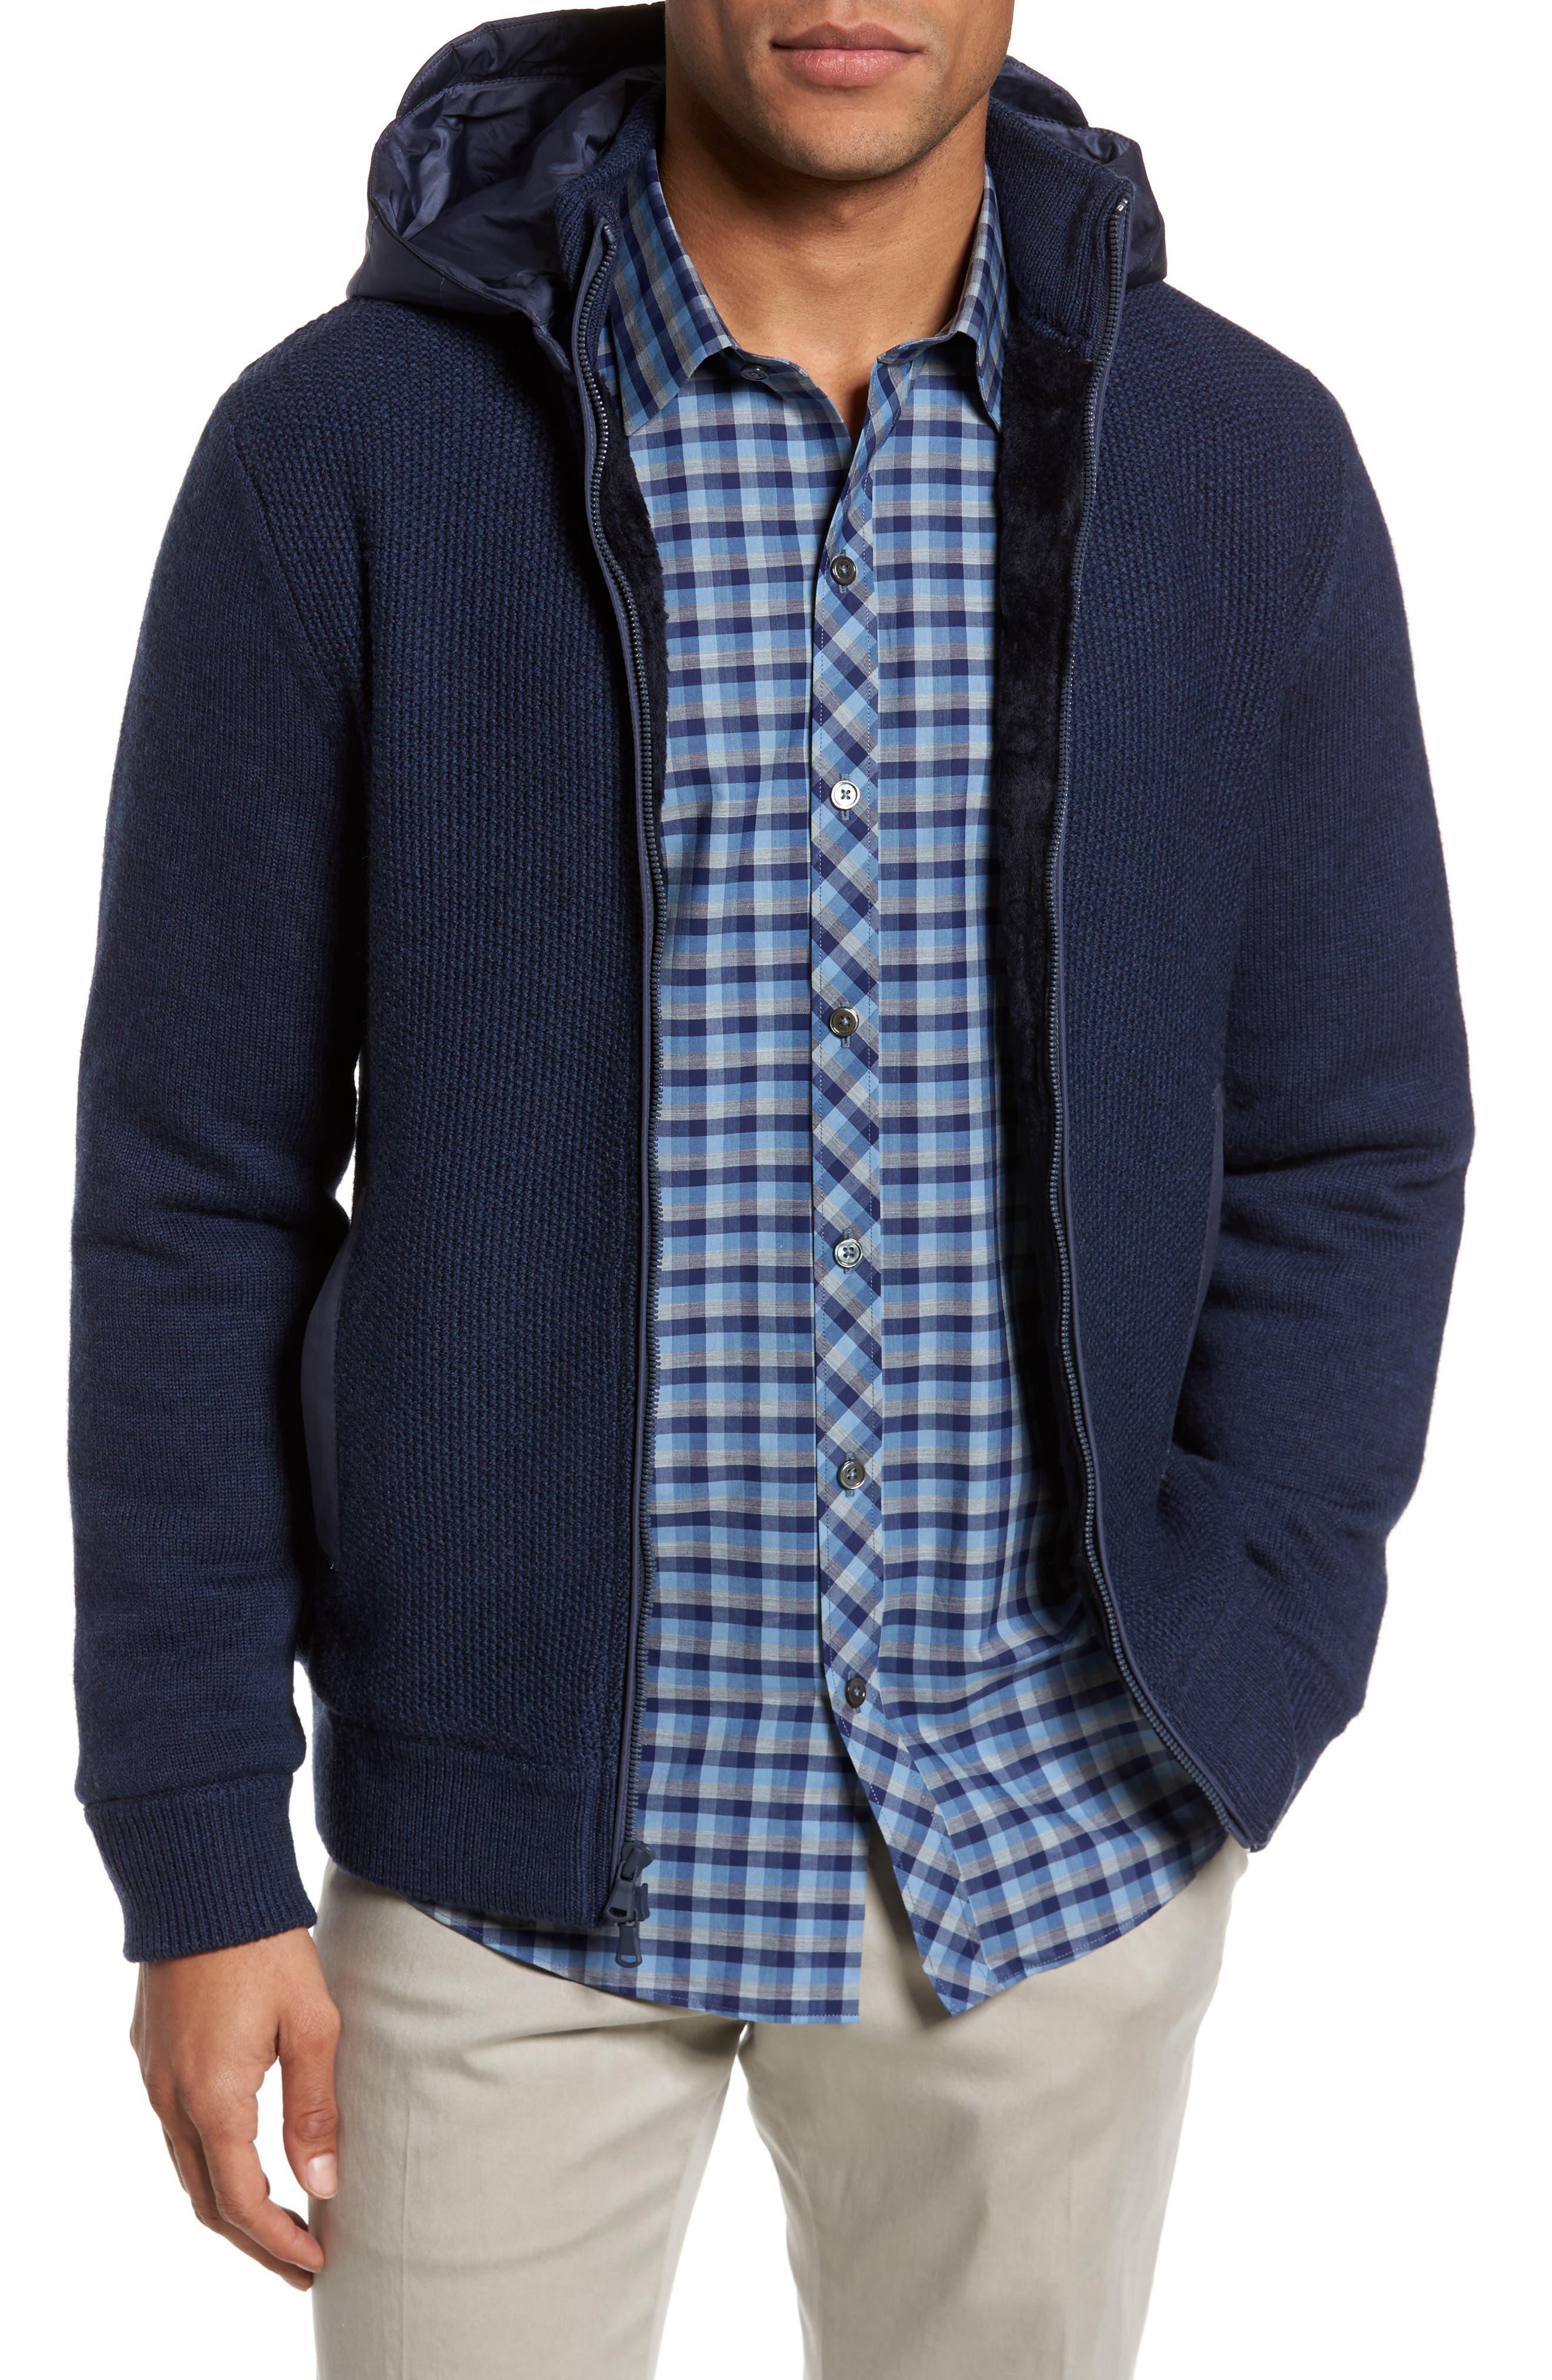 Haydon Merino Wool Sweater Jacket,                         Main,                         color, 410